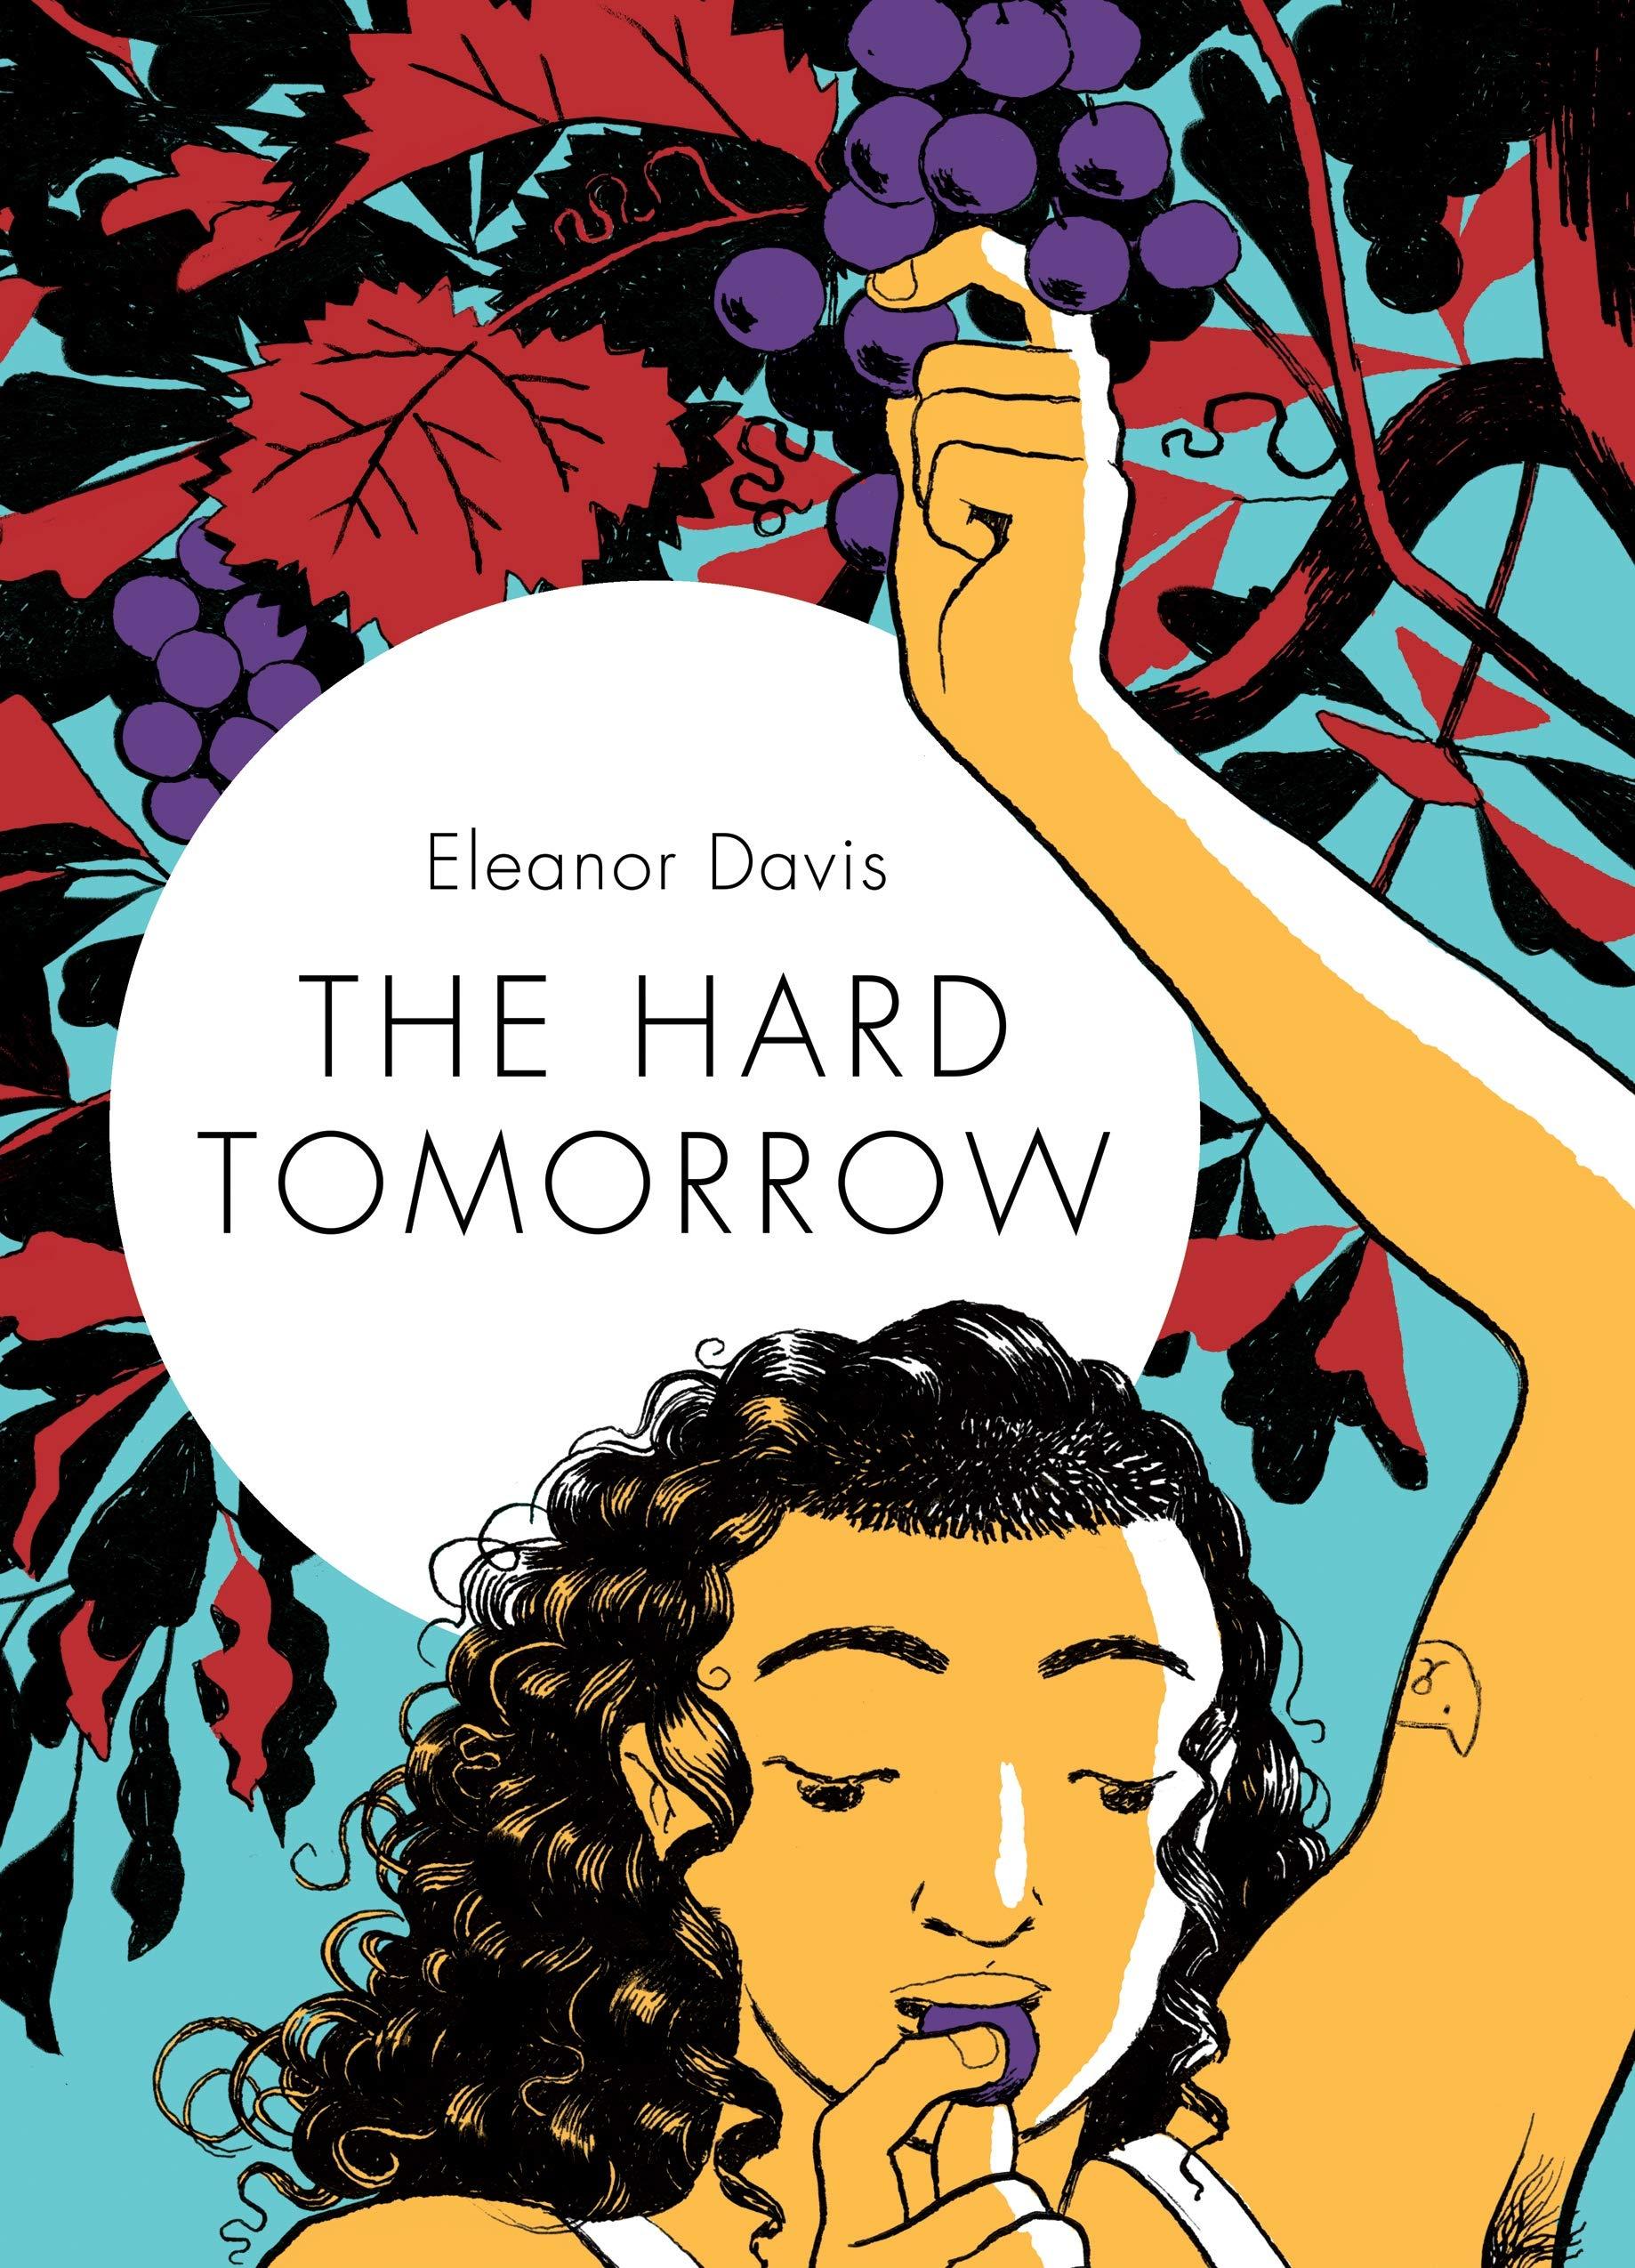 Best Comics of 2019: The Hard Tomorrow